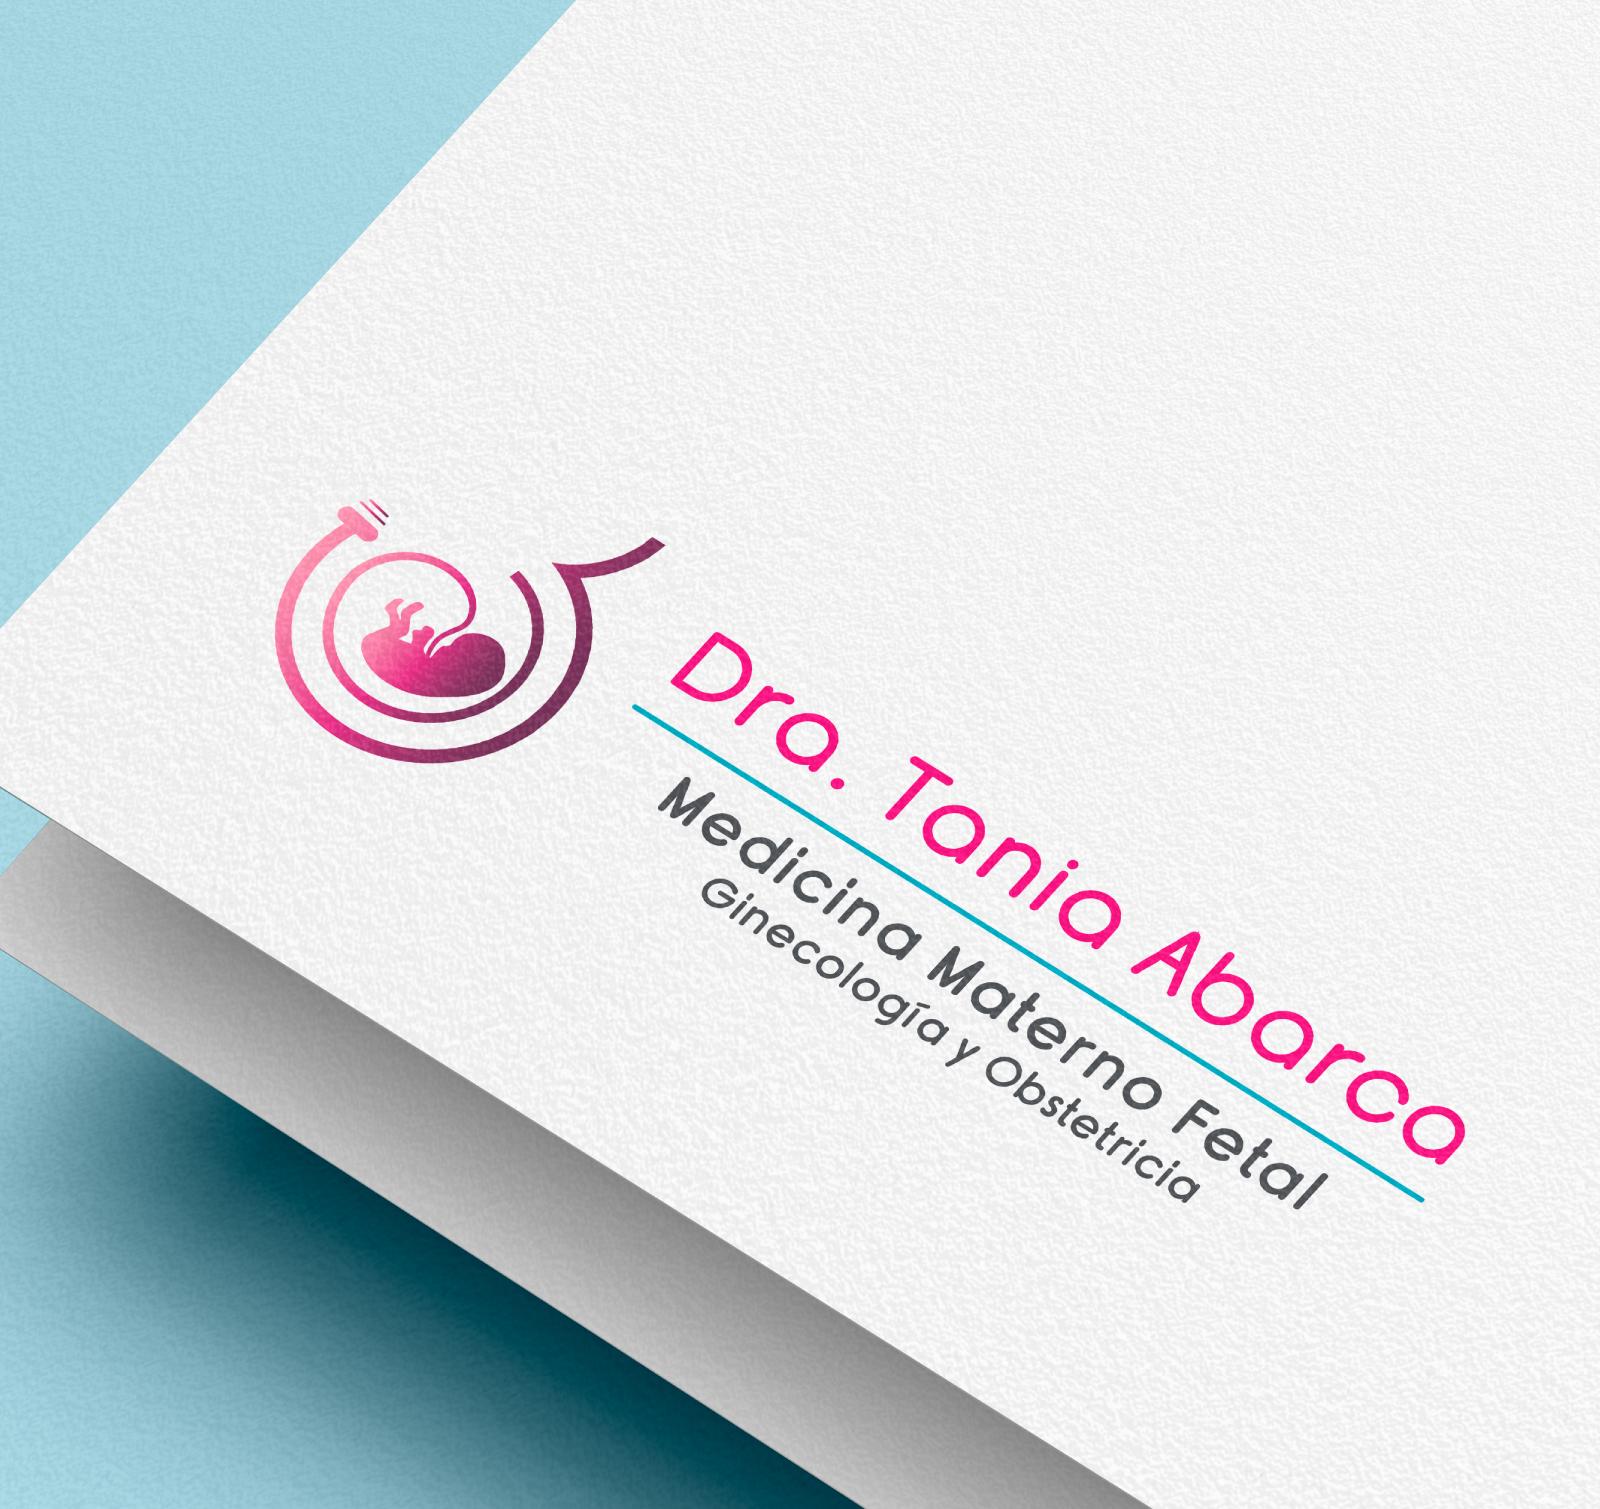 Identidad Corporativa Dra Tania Abarca